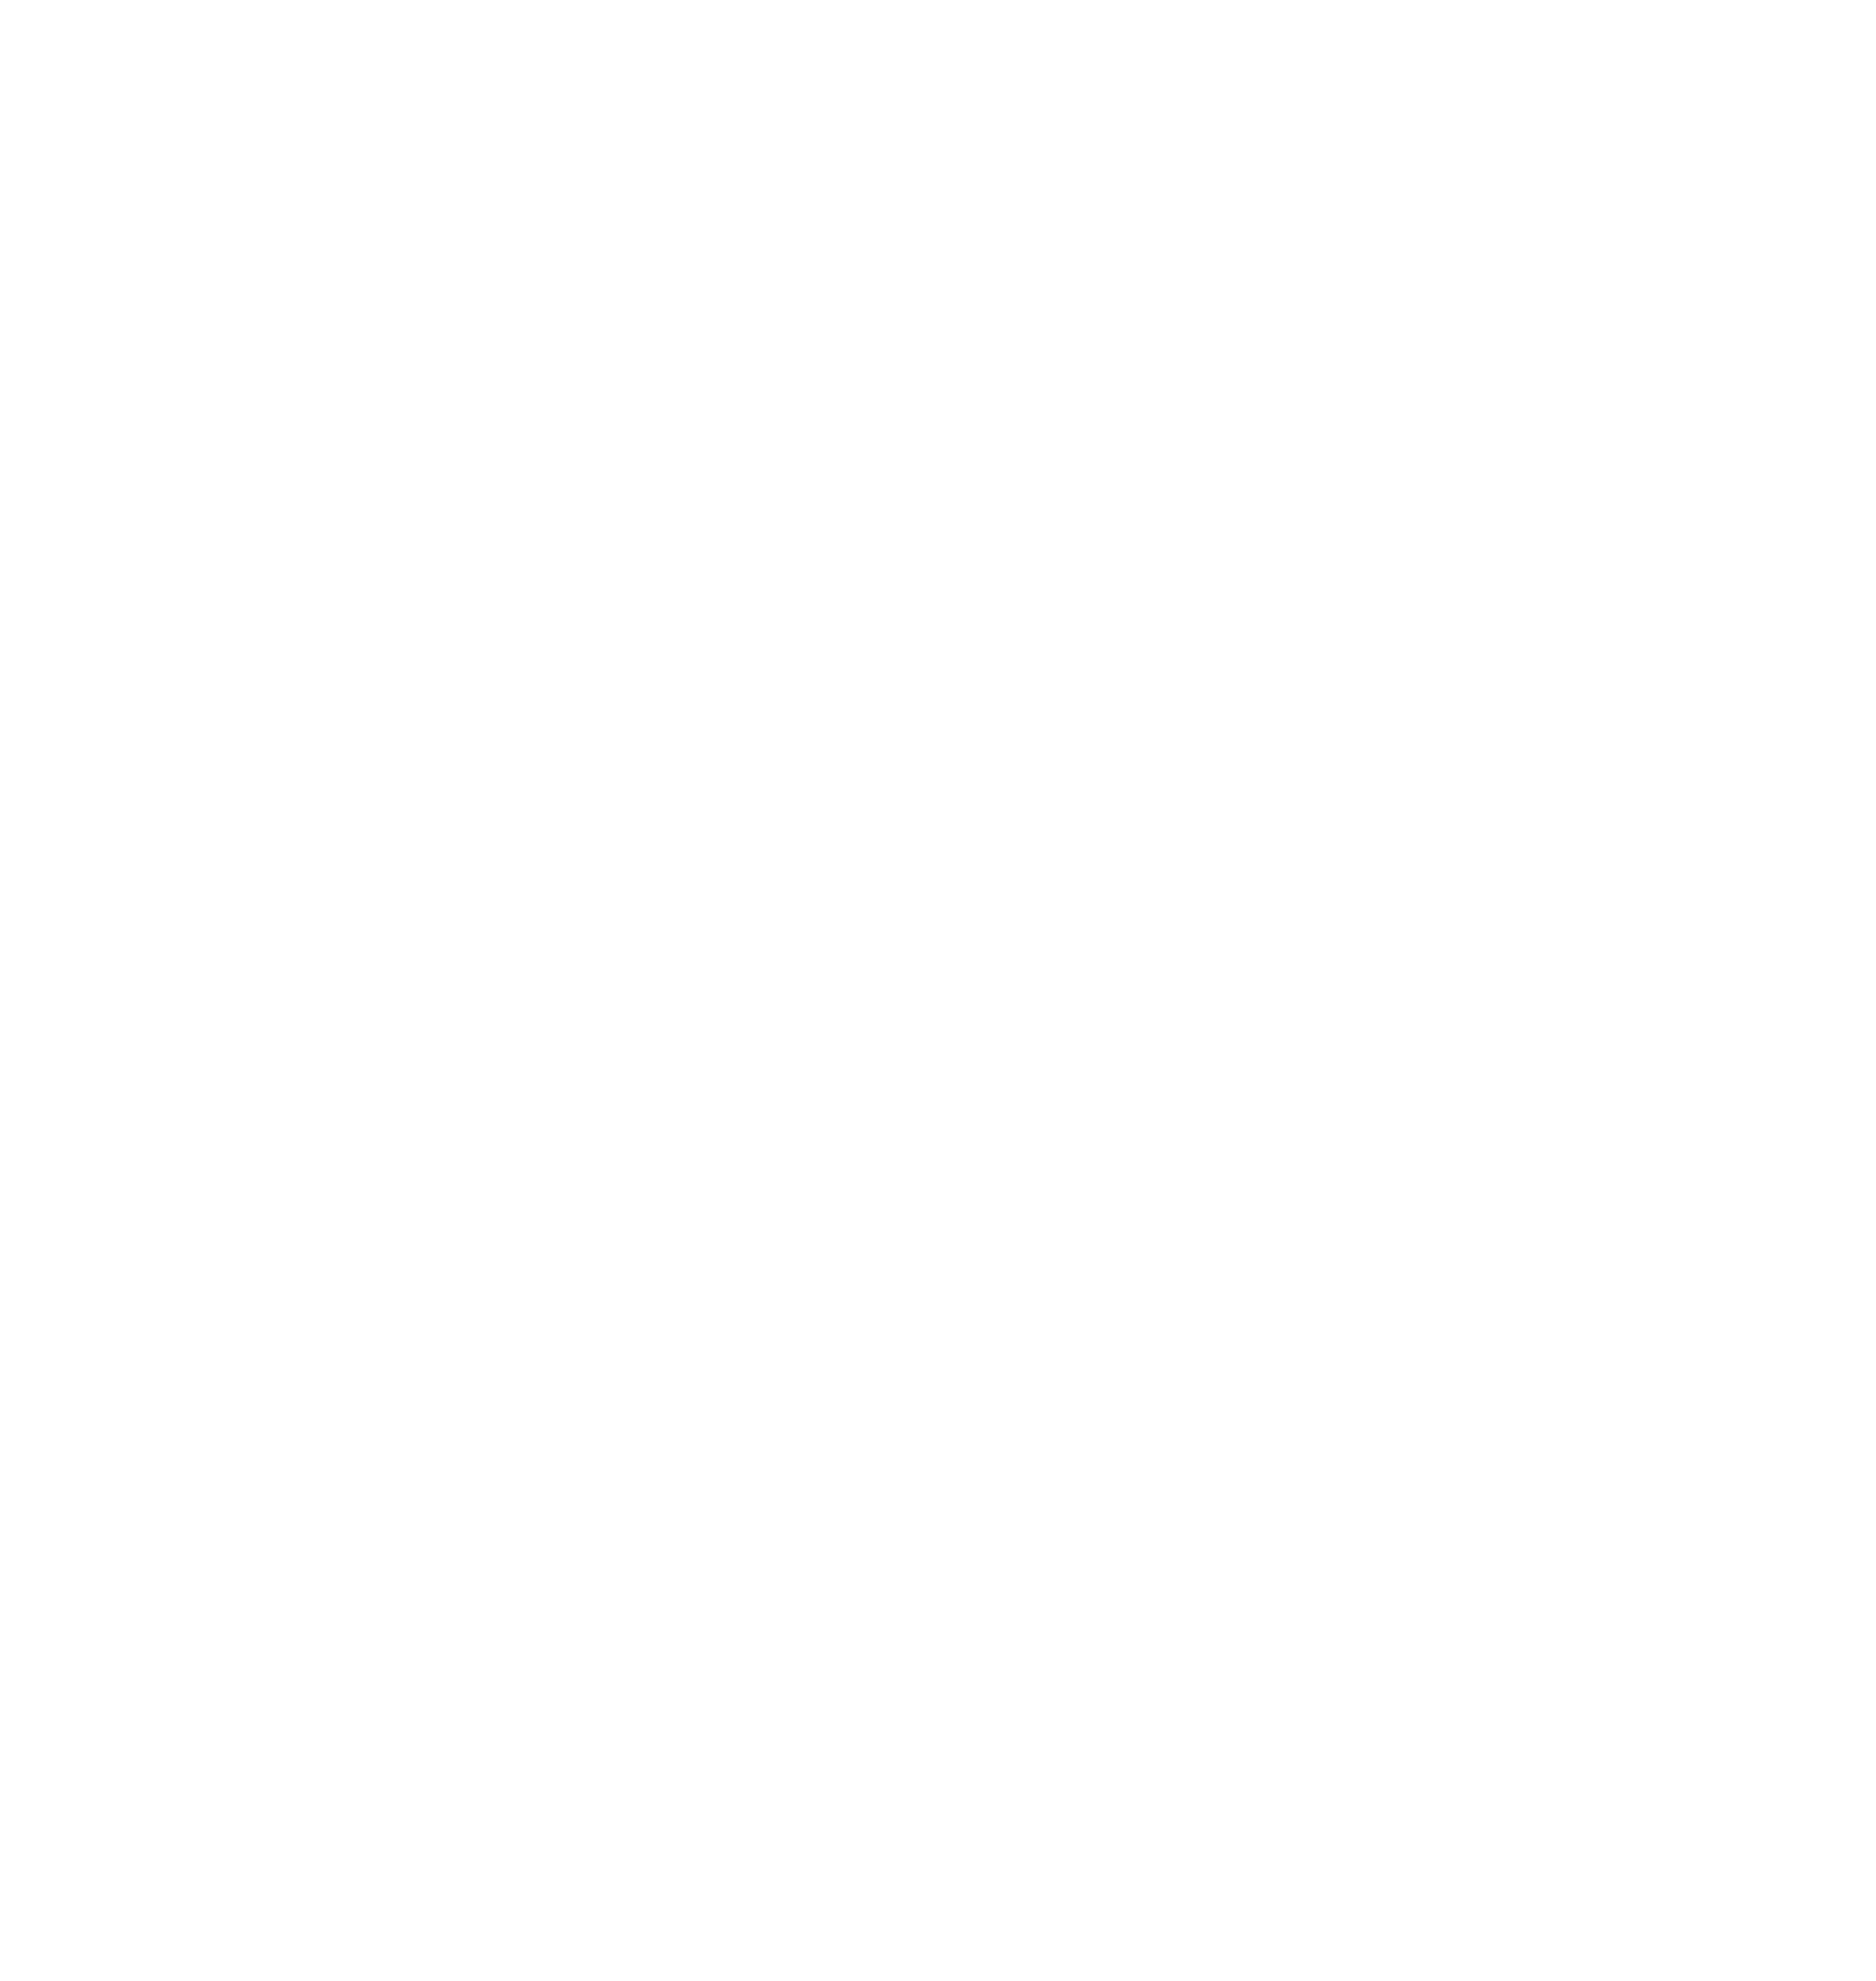 KUCHYŇSKÁ BATERIE SCHOCK LAIOS WHITE GOLD 517000